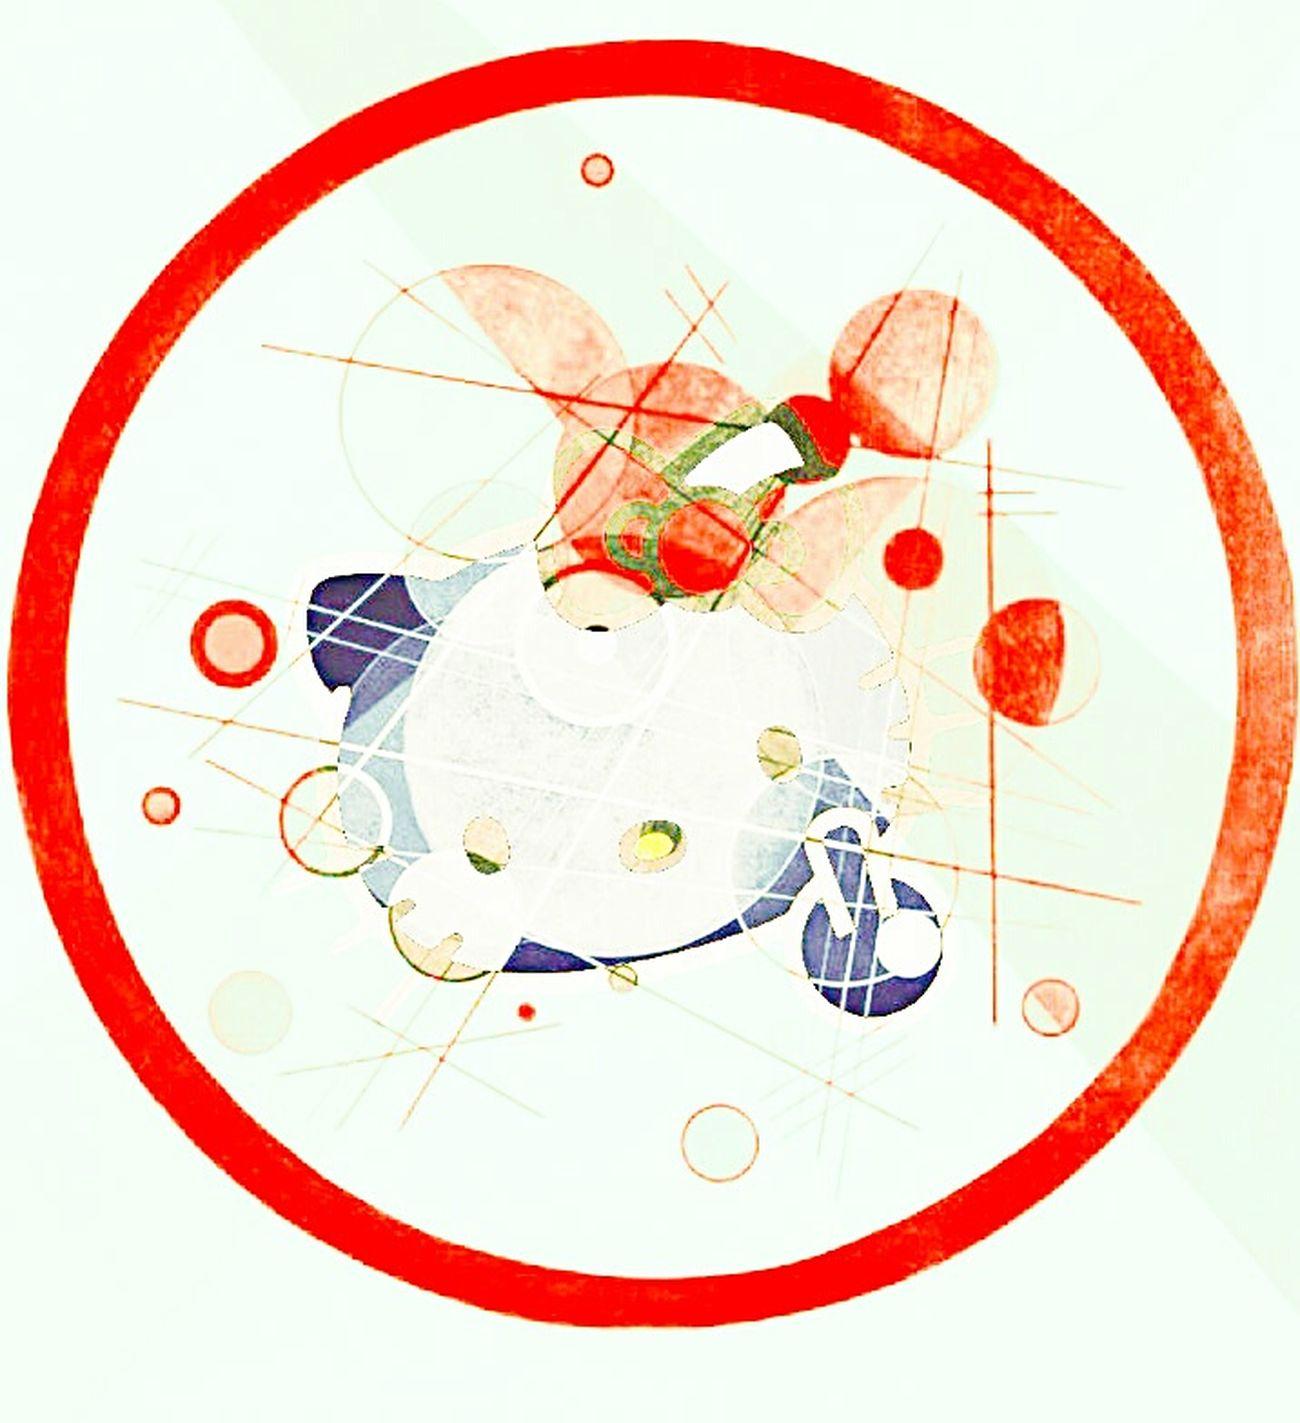 Planet - Space Astrology Sign Shape Map Homma Bulla Entraves Toi Seule Maintenant Mercedes Mother Nature System Brûles Sous Mes Lyrics